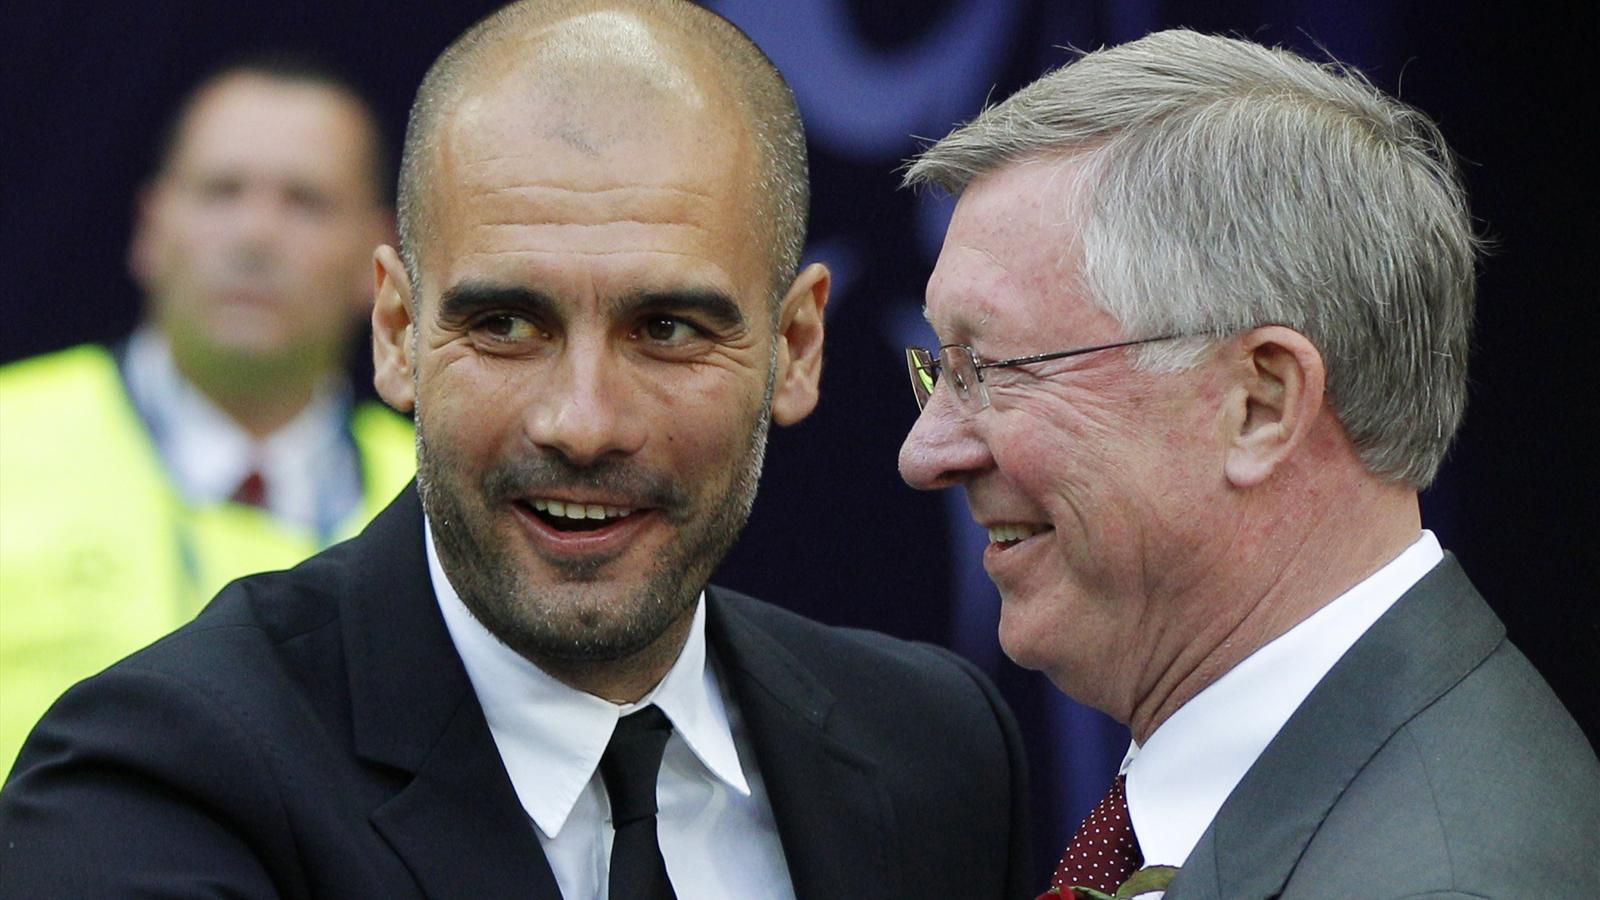 Former Barcelona coach Pep Guardiola (L) and former Manchester United manager Sir Alex Ferguson